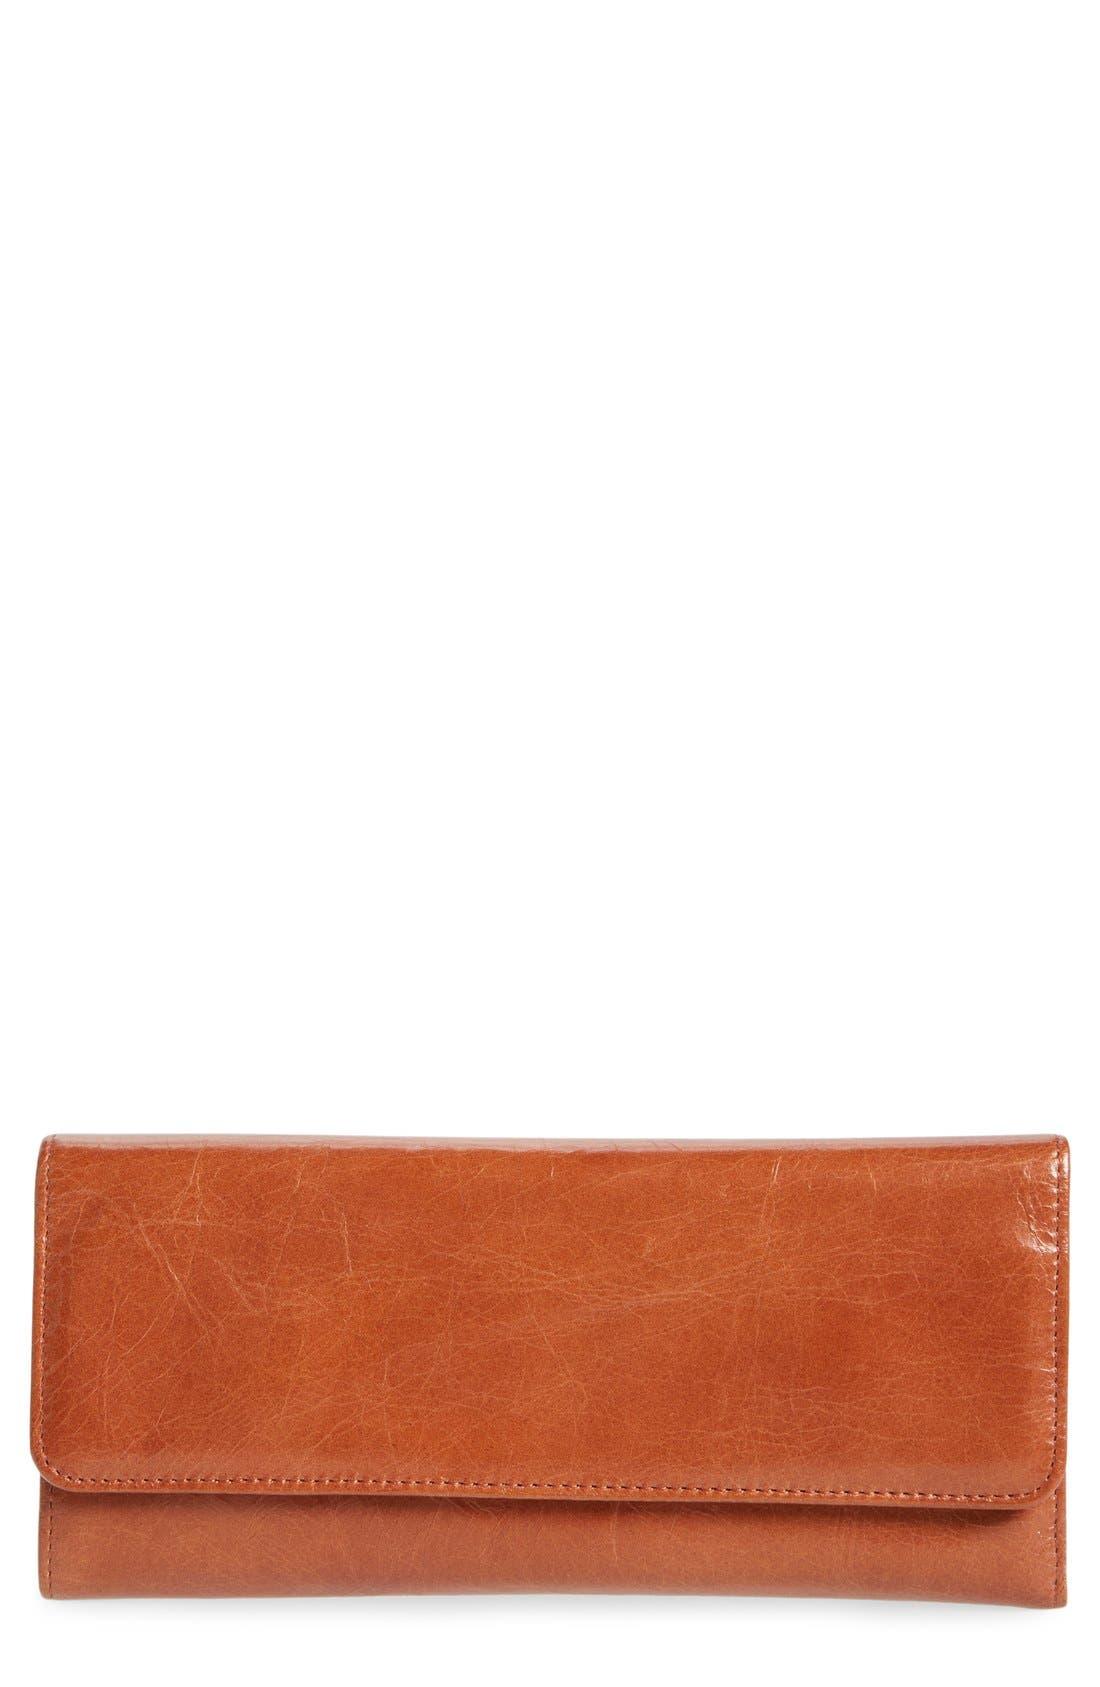 'Sadie' Leather Wallet,                             Main thumbnail 23, color,